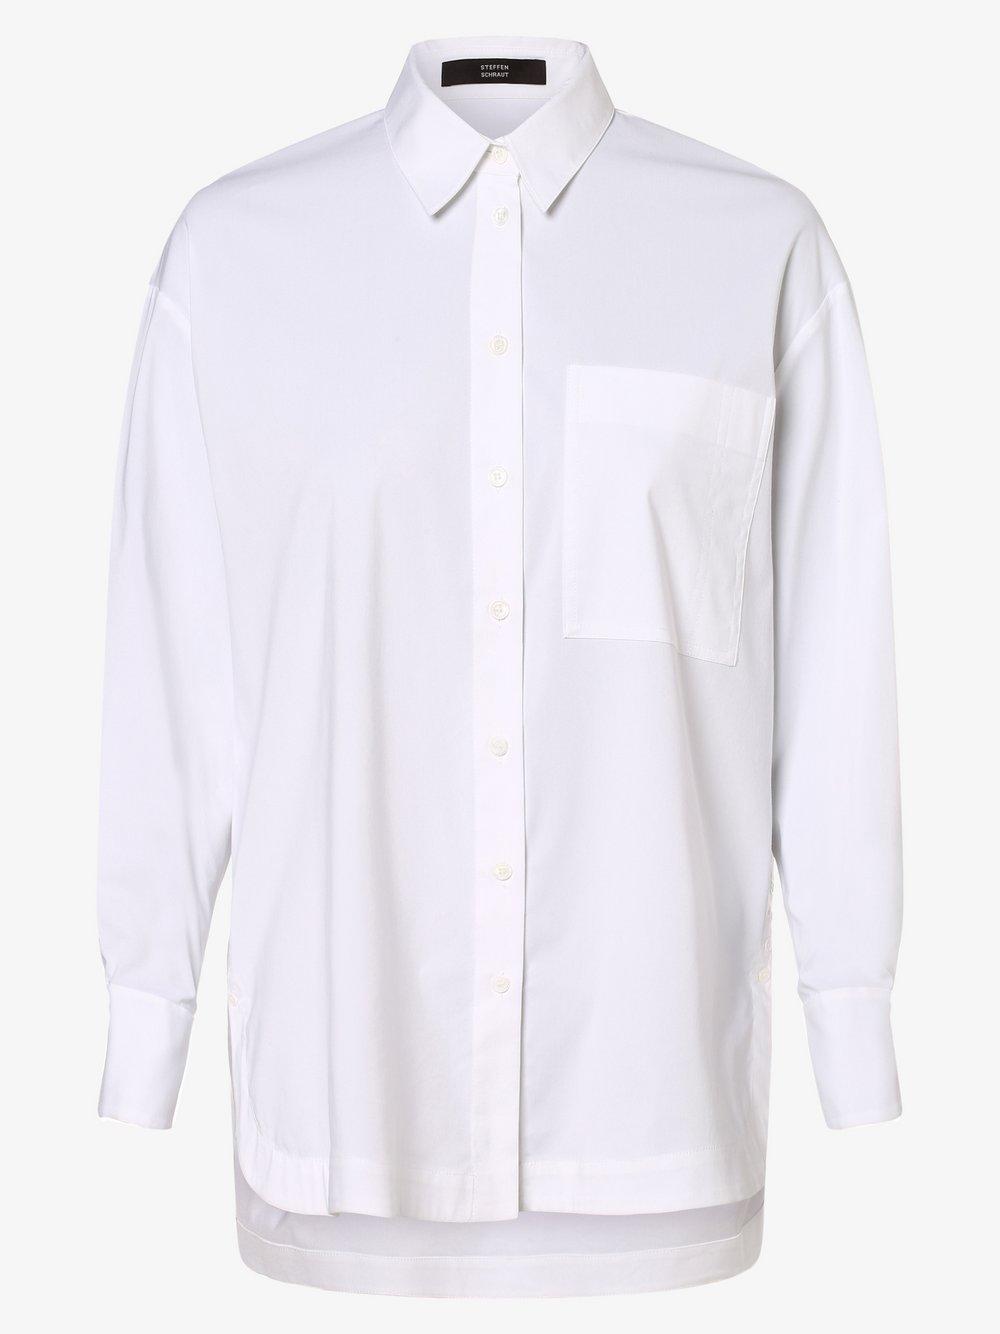 STEFFEN SCHRAUT – Bluzka damska, biały Van Graaf 479472-0001-00380